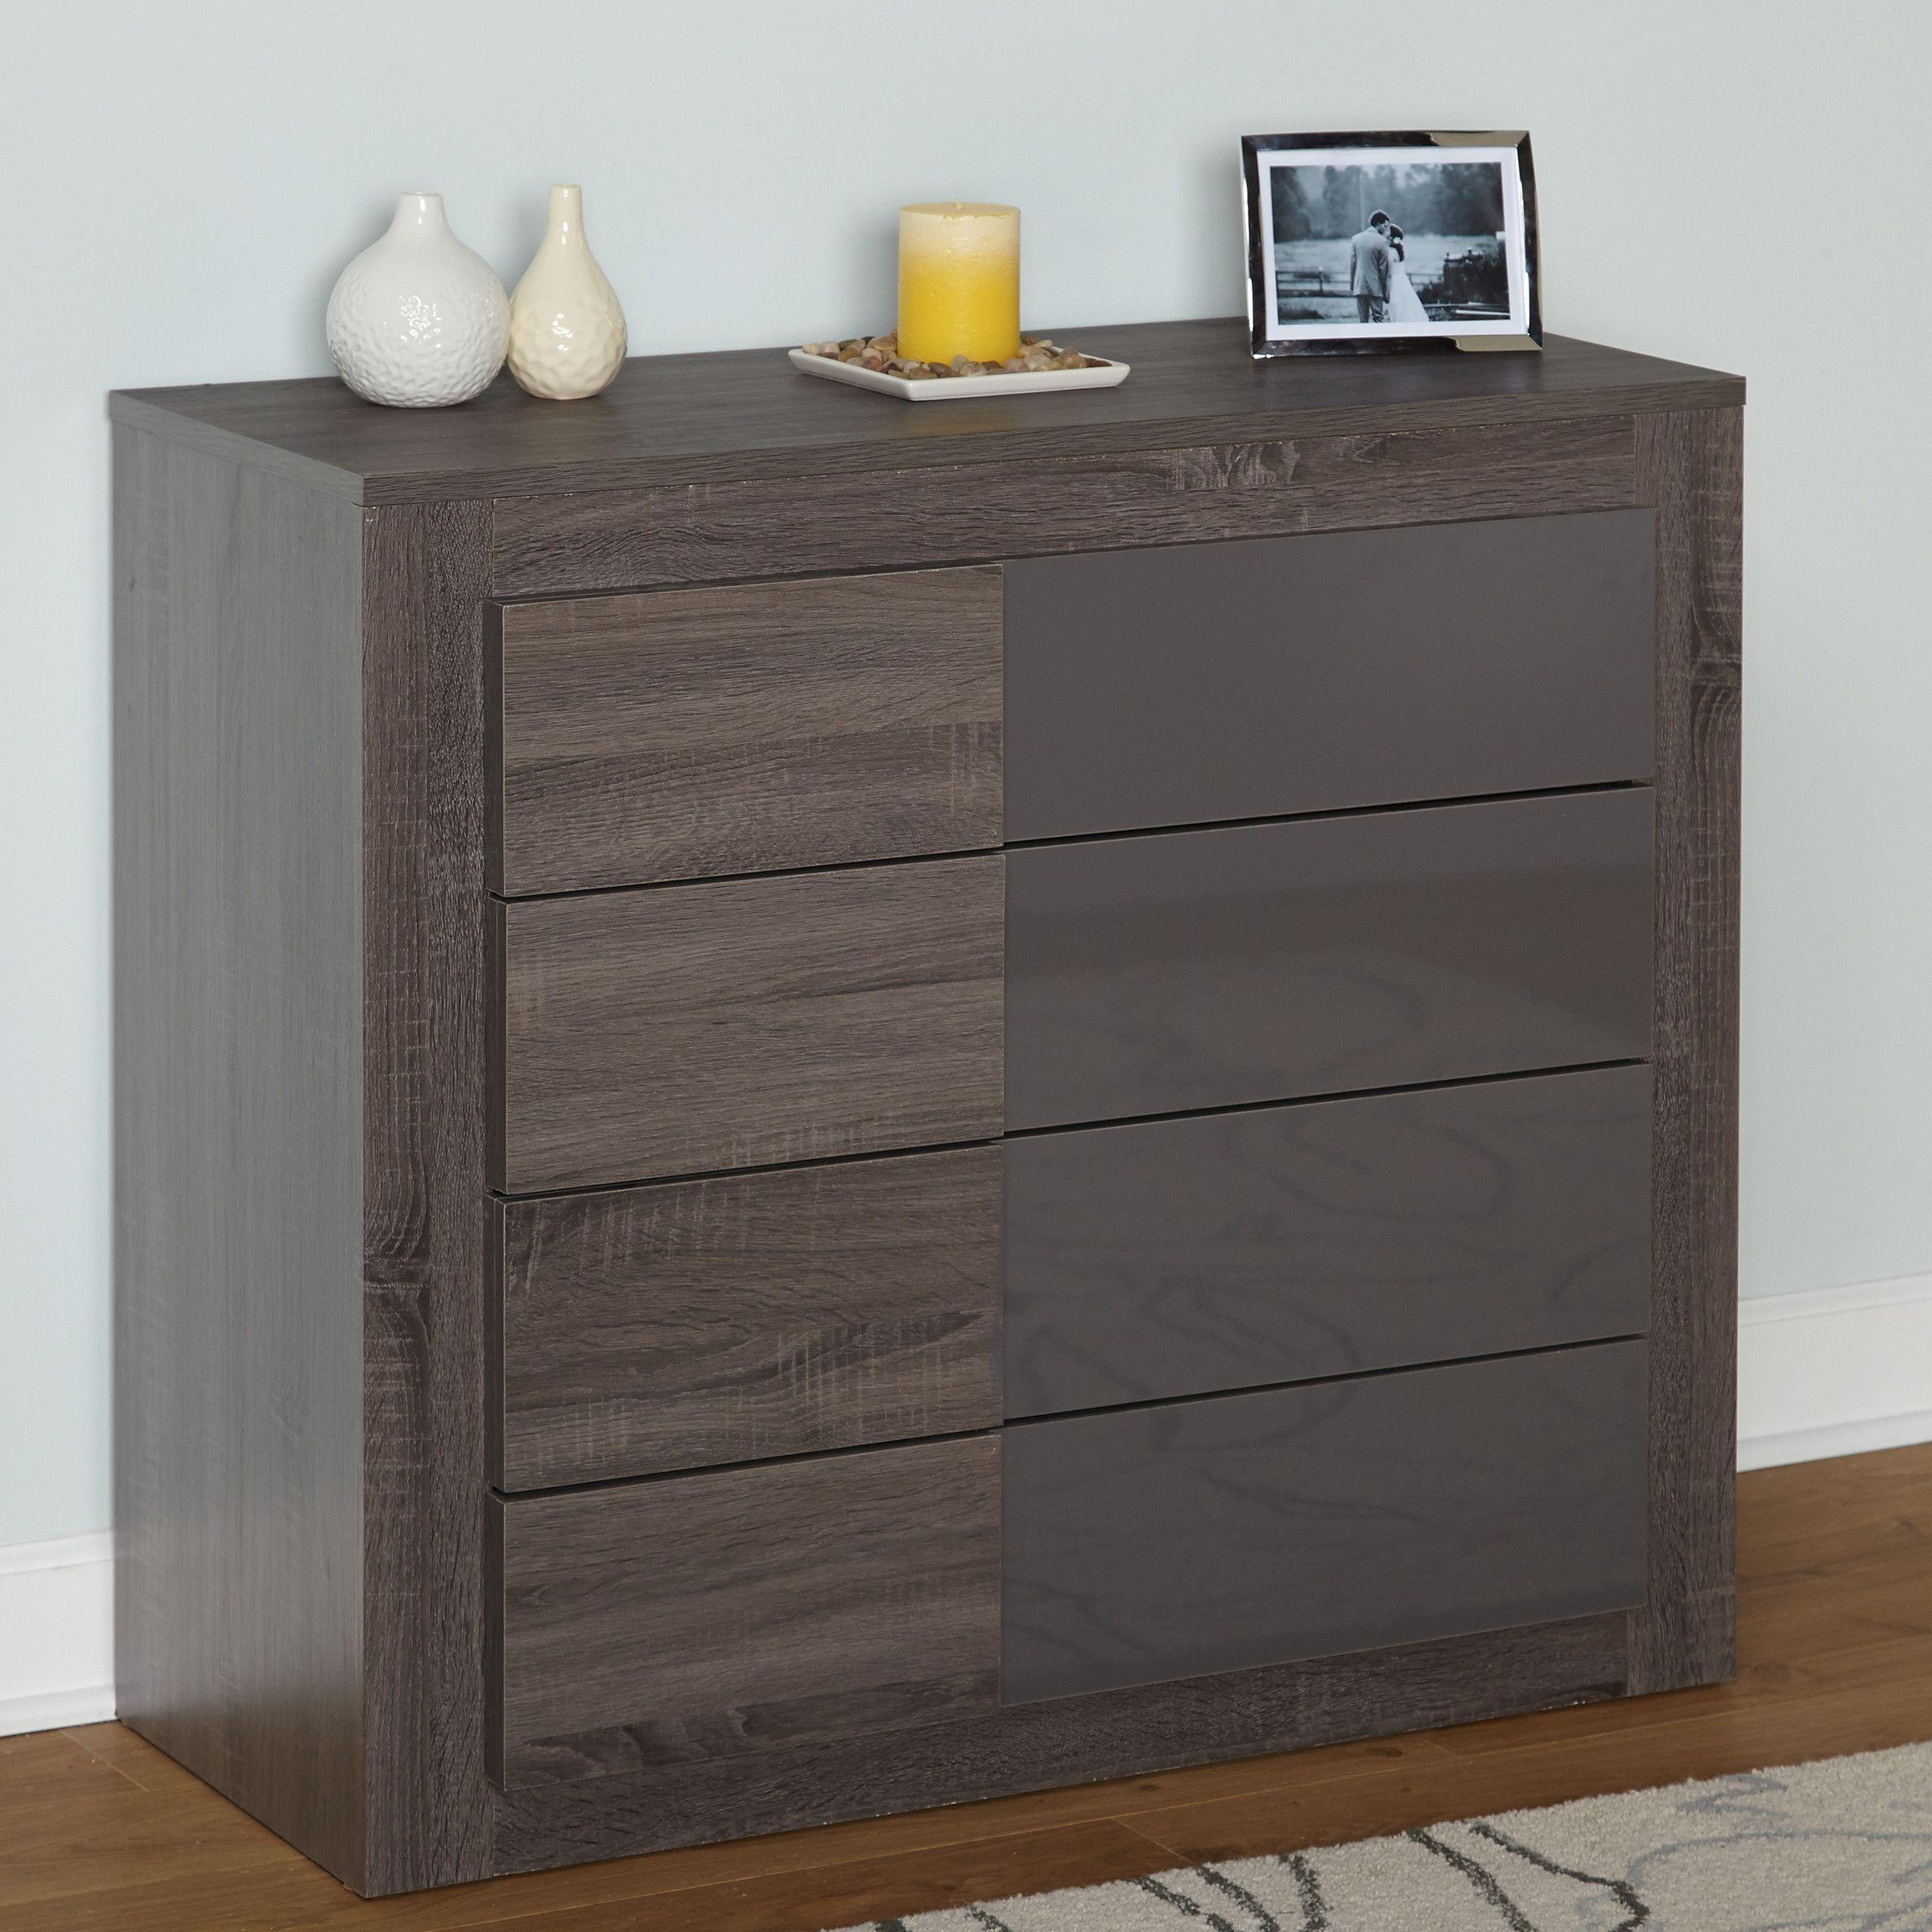 Tms Eden 4 Drawer Chest Dresser Furniture Drawers [ 2400 x 2400 Pixel ]